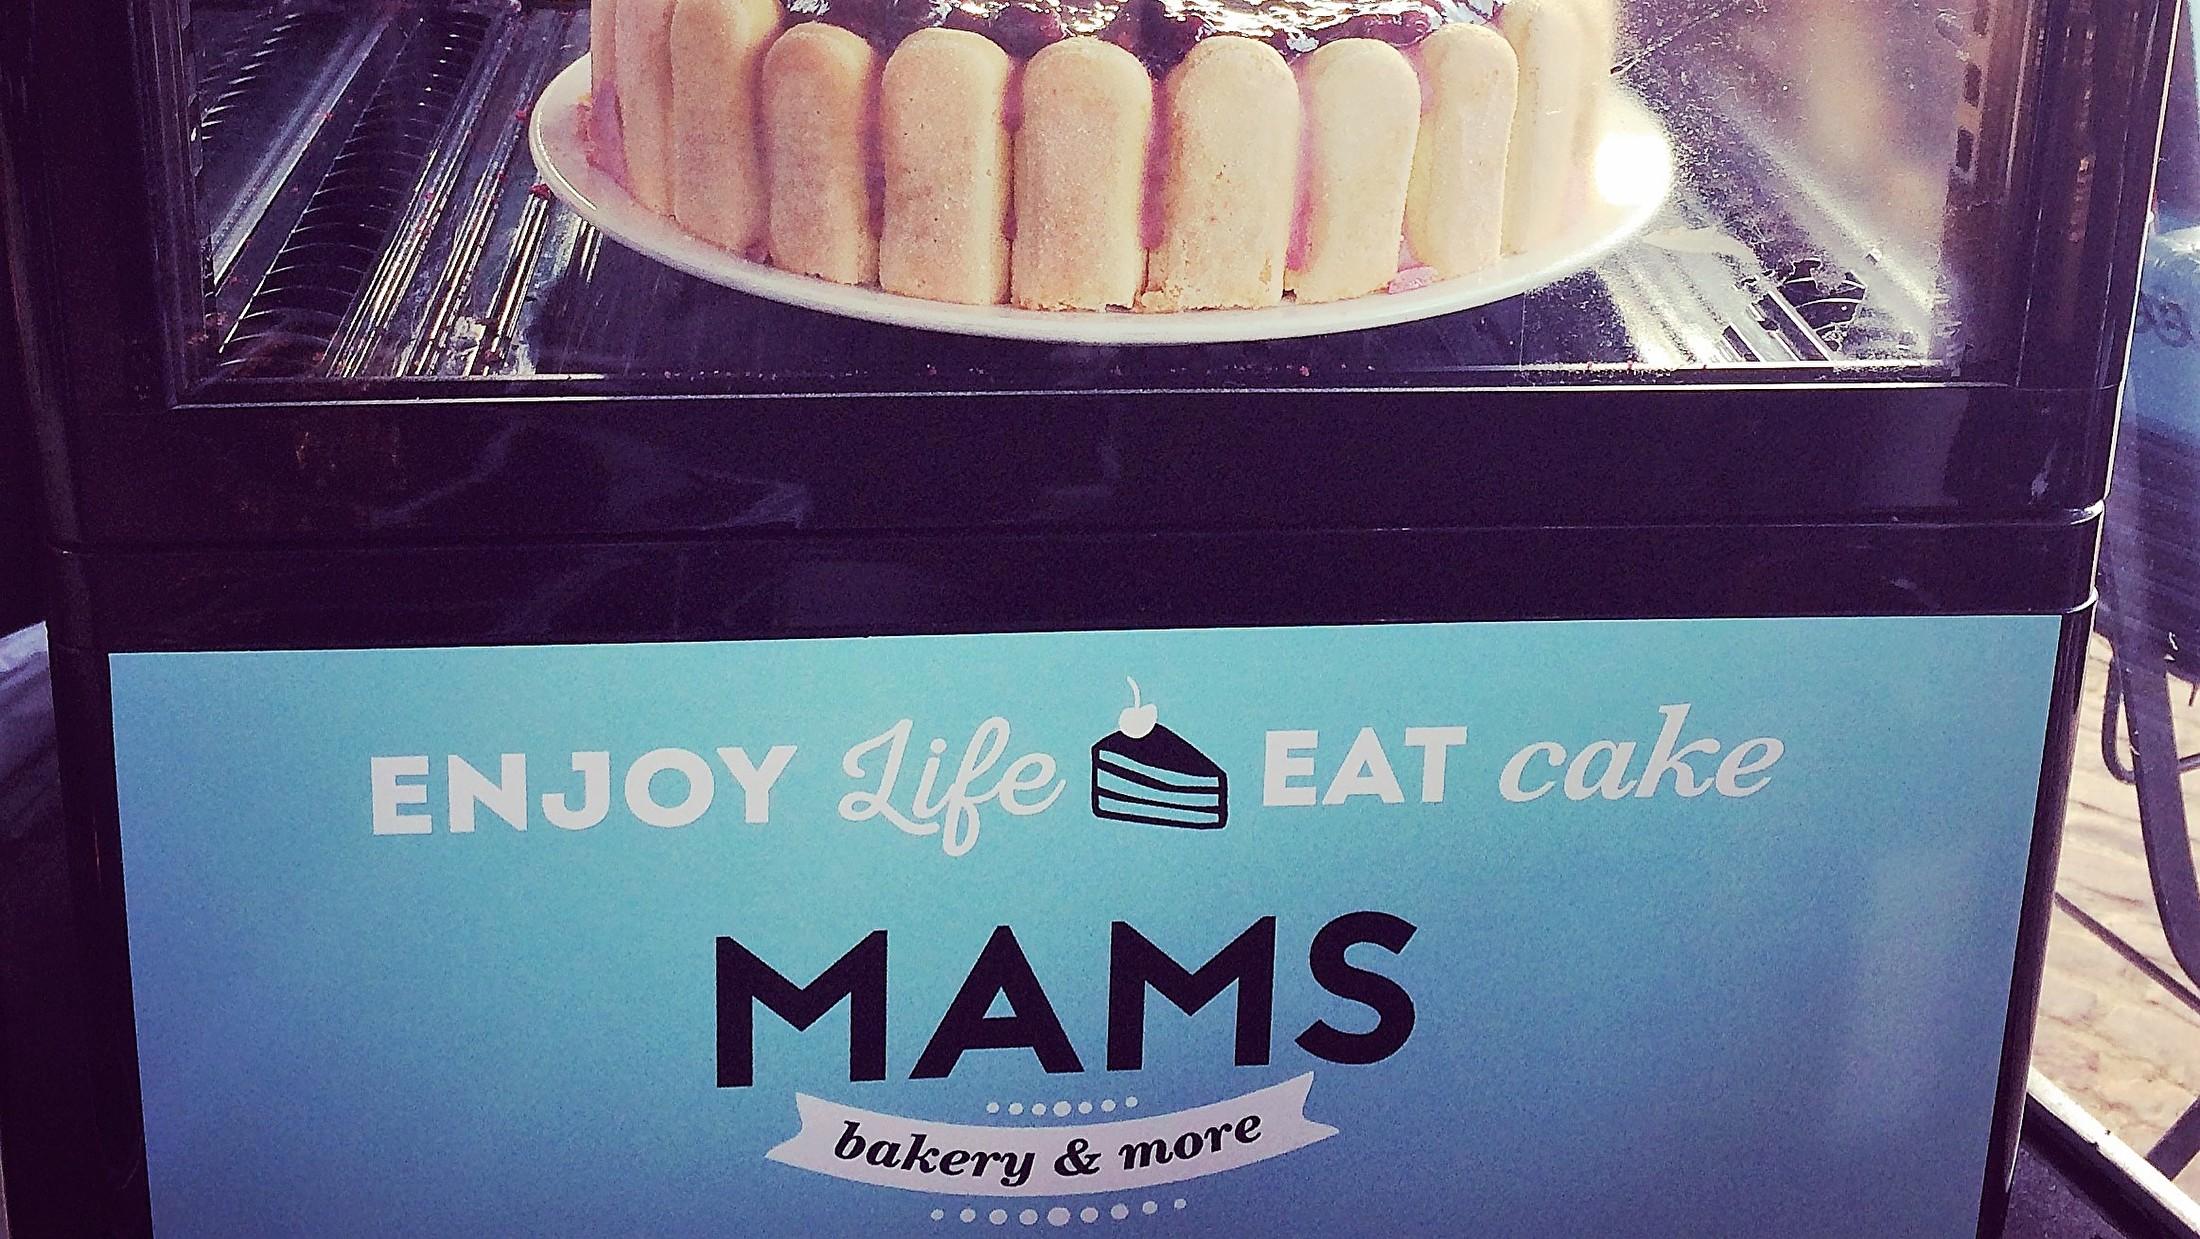 Mams bakery